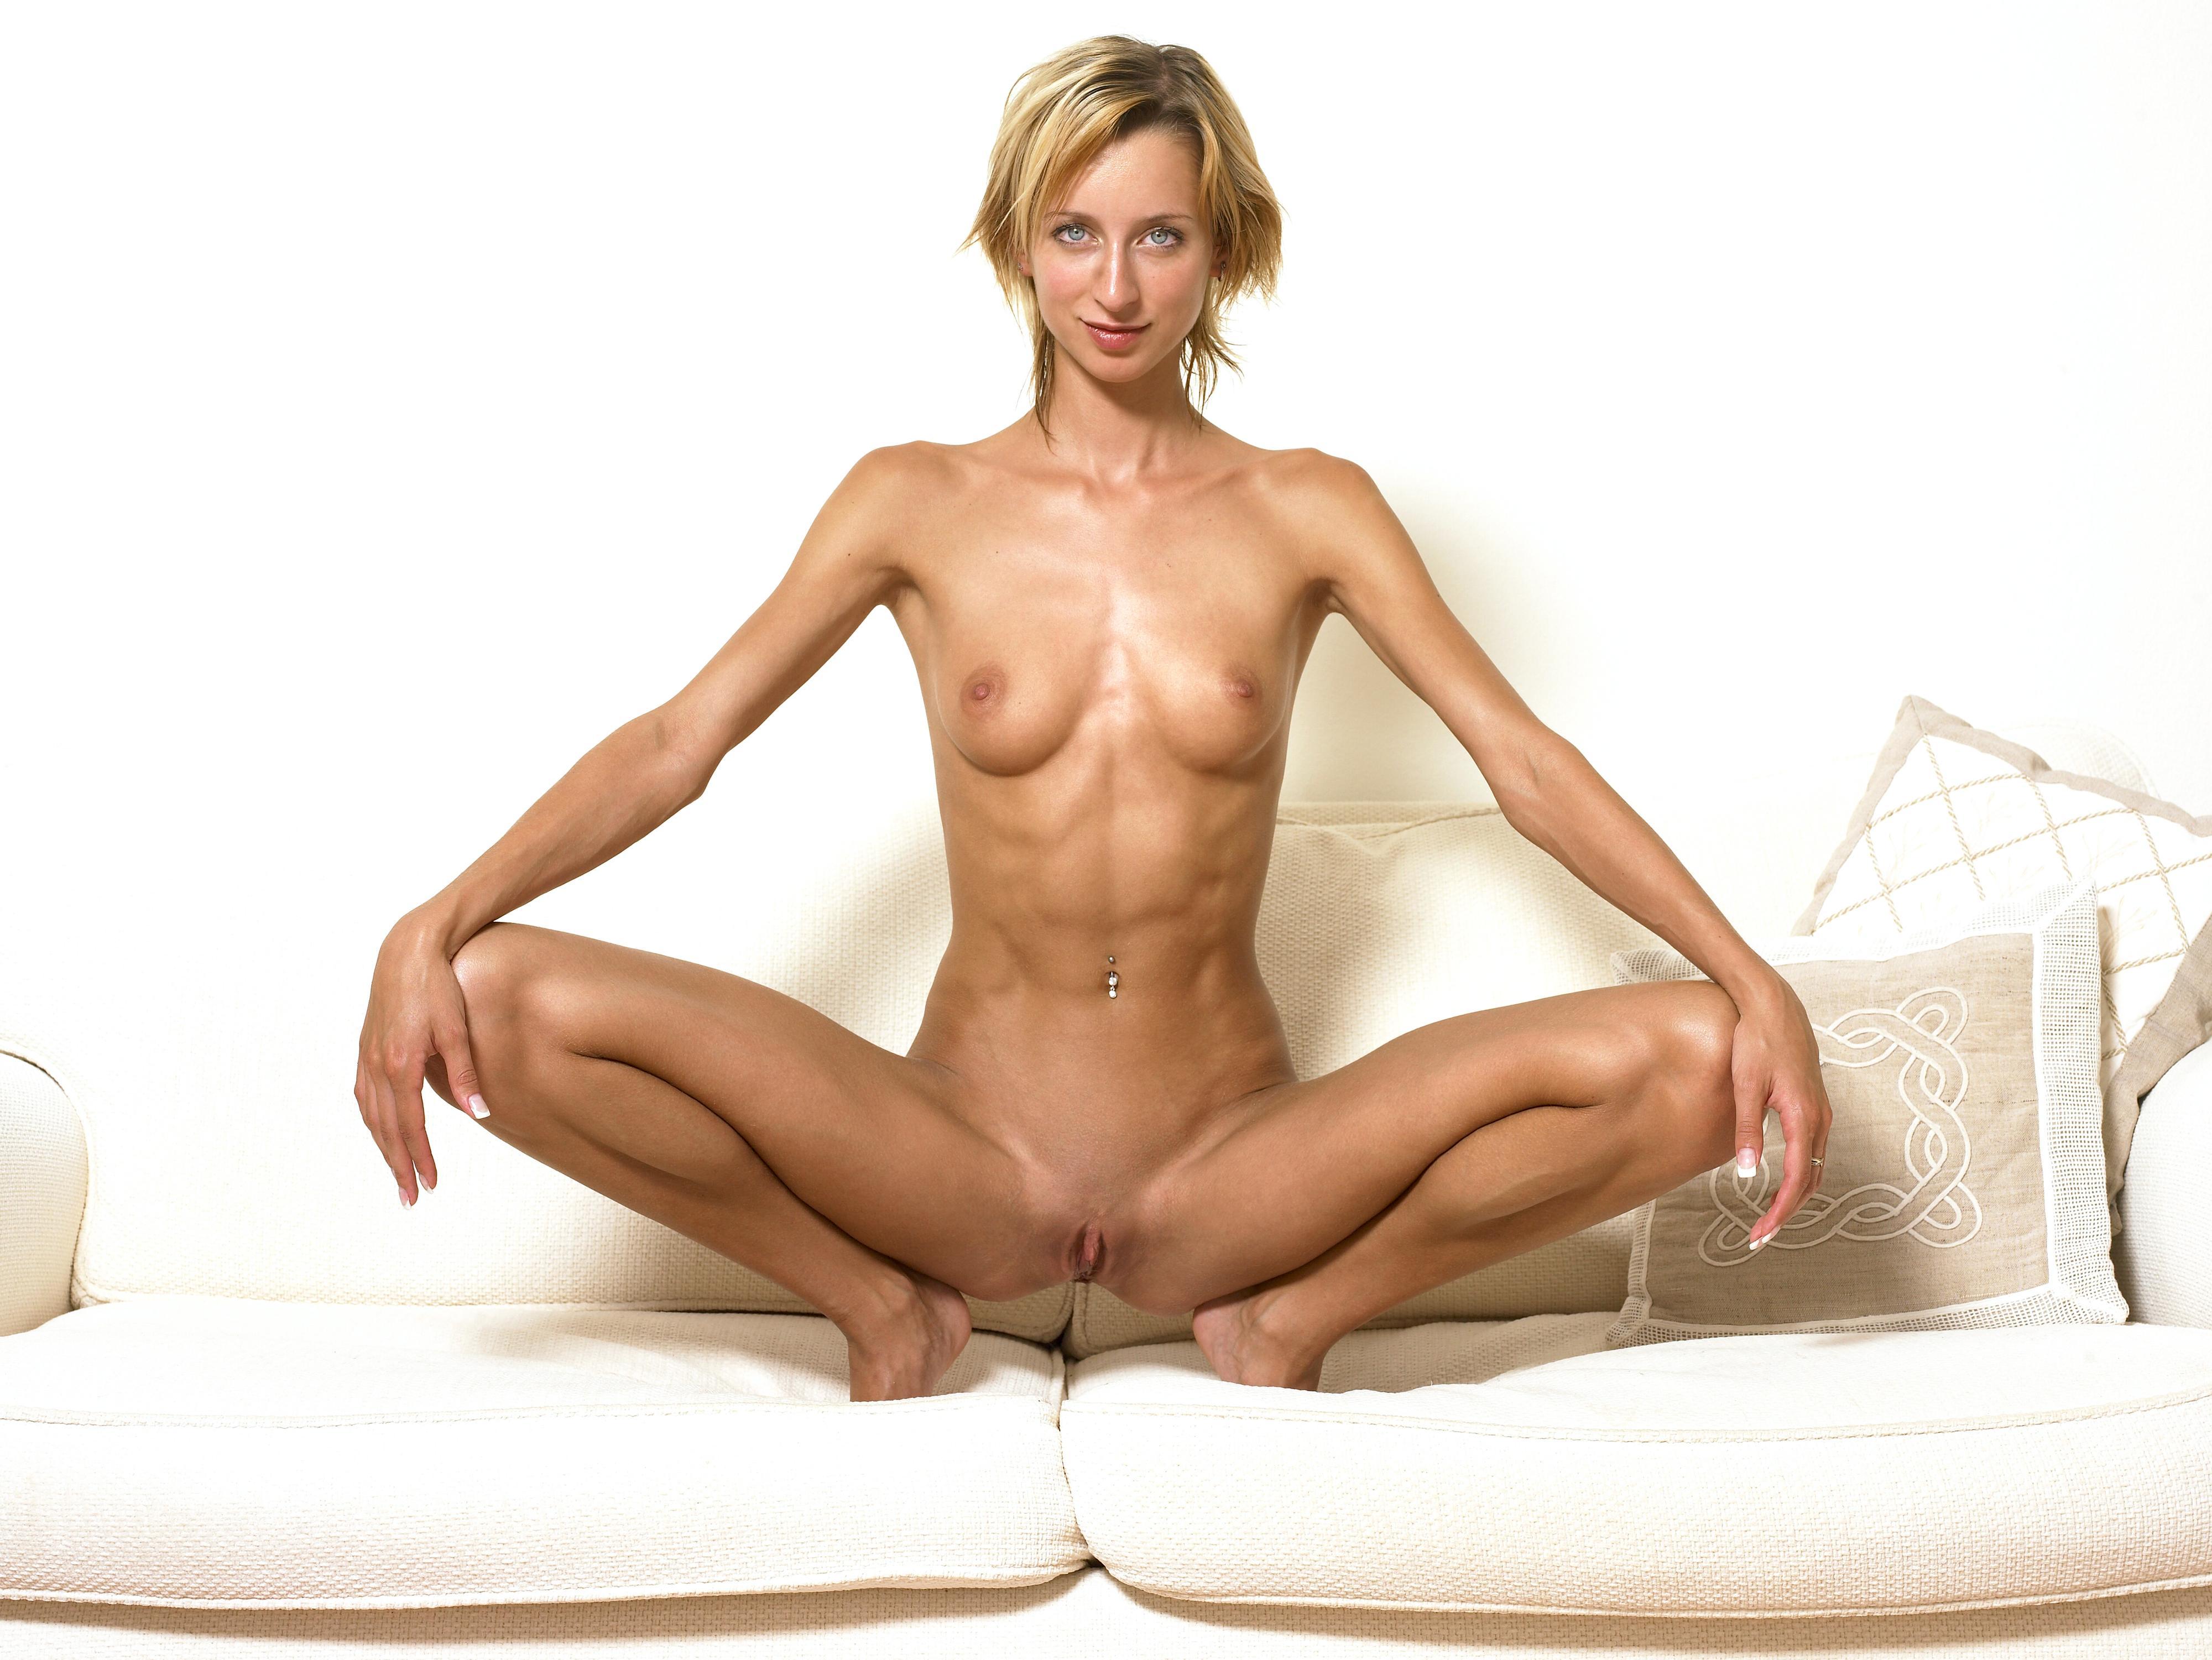 Энн кирай порно фото 5 фотография